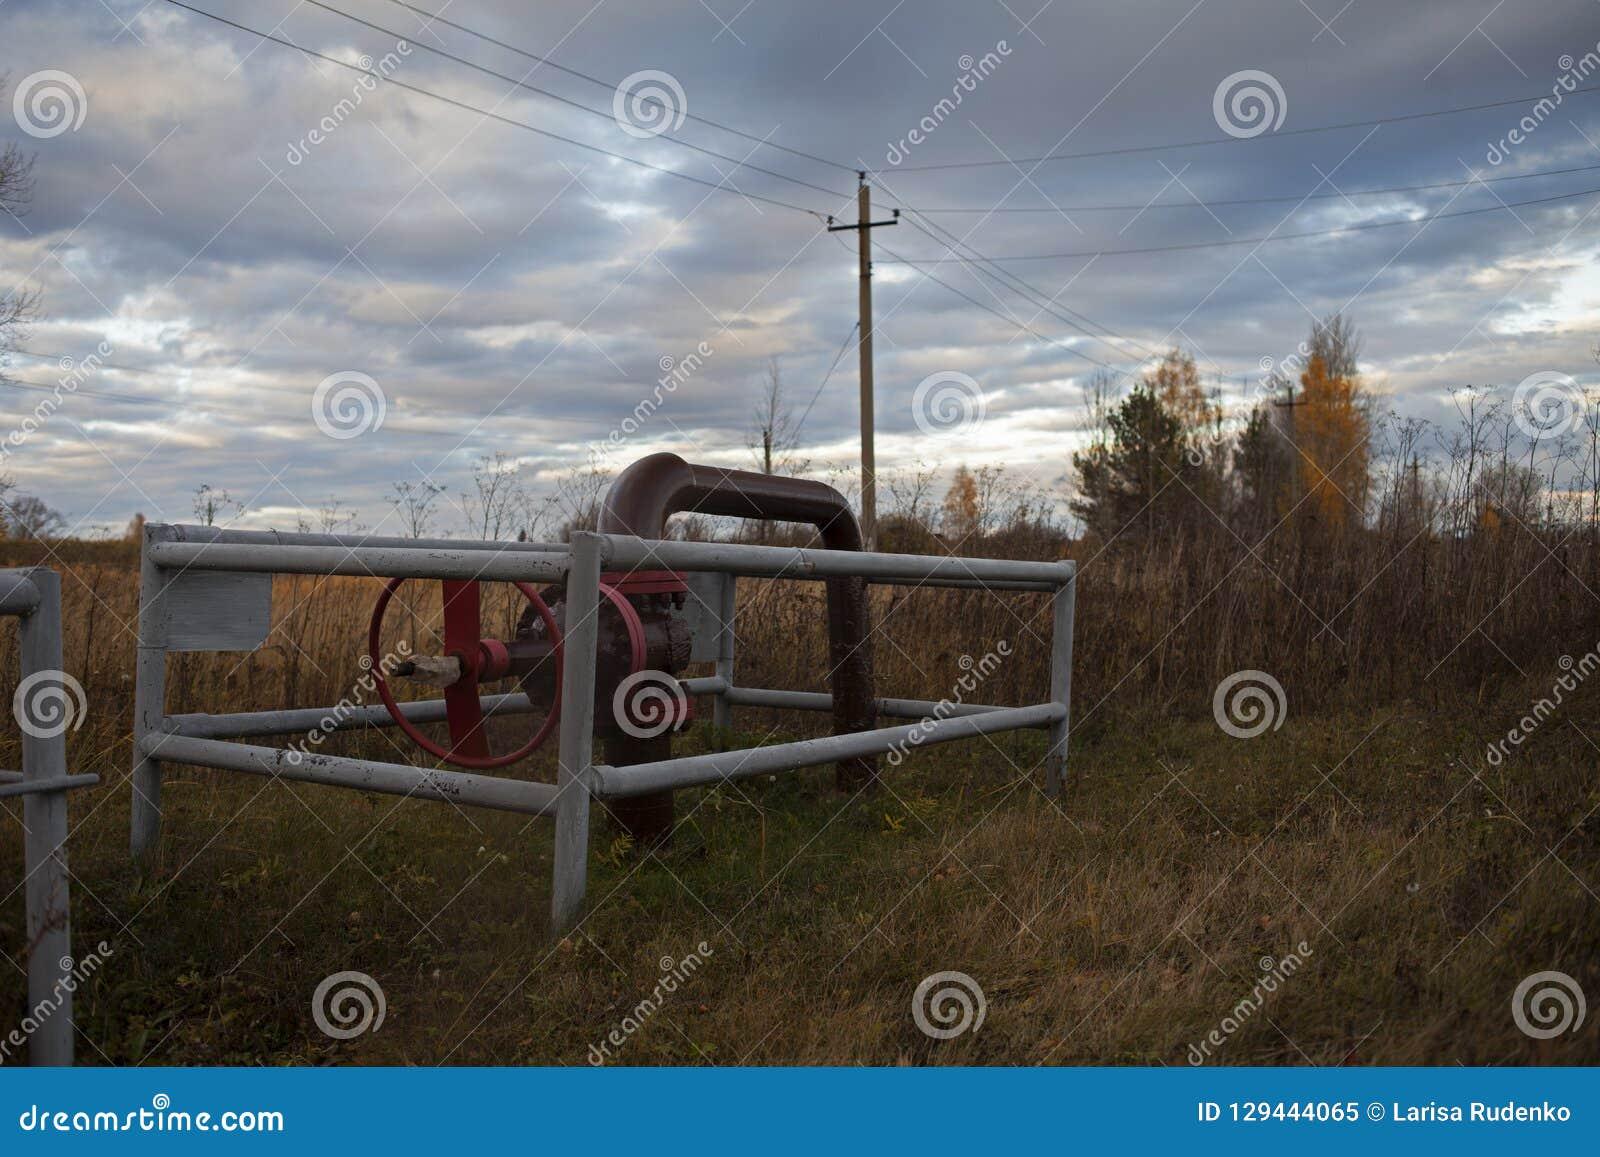 Shut-off valve for disconnected oil pump. Russia, Bashneft, Rosneft.